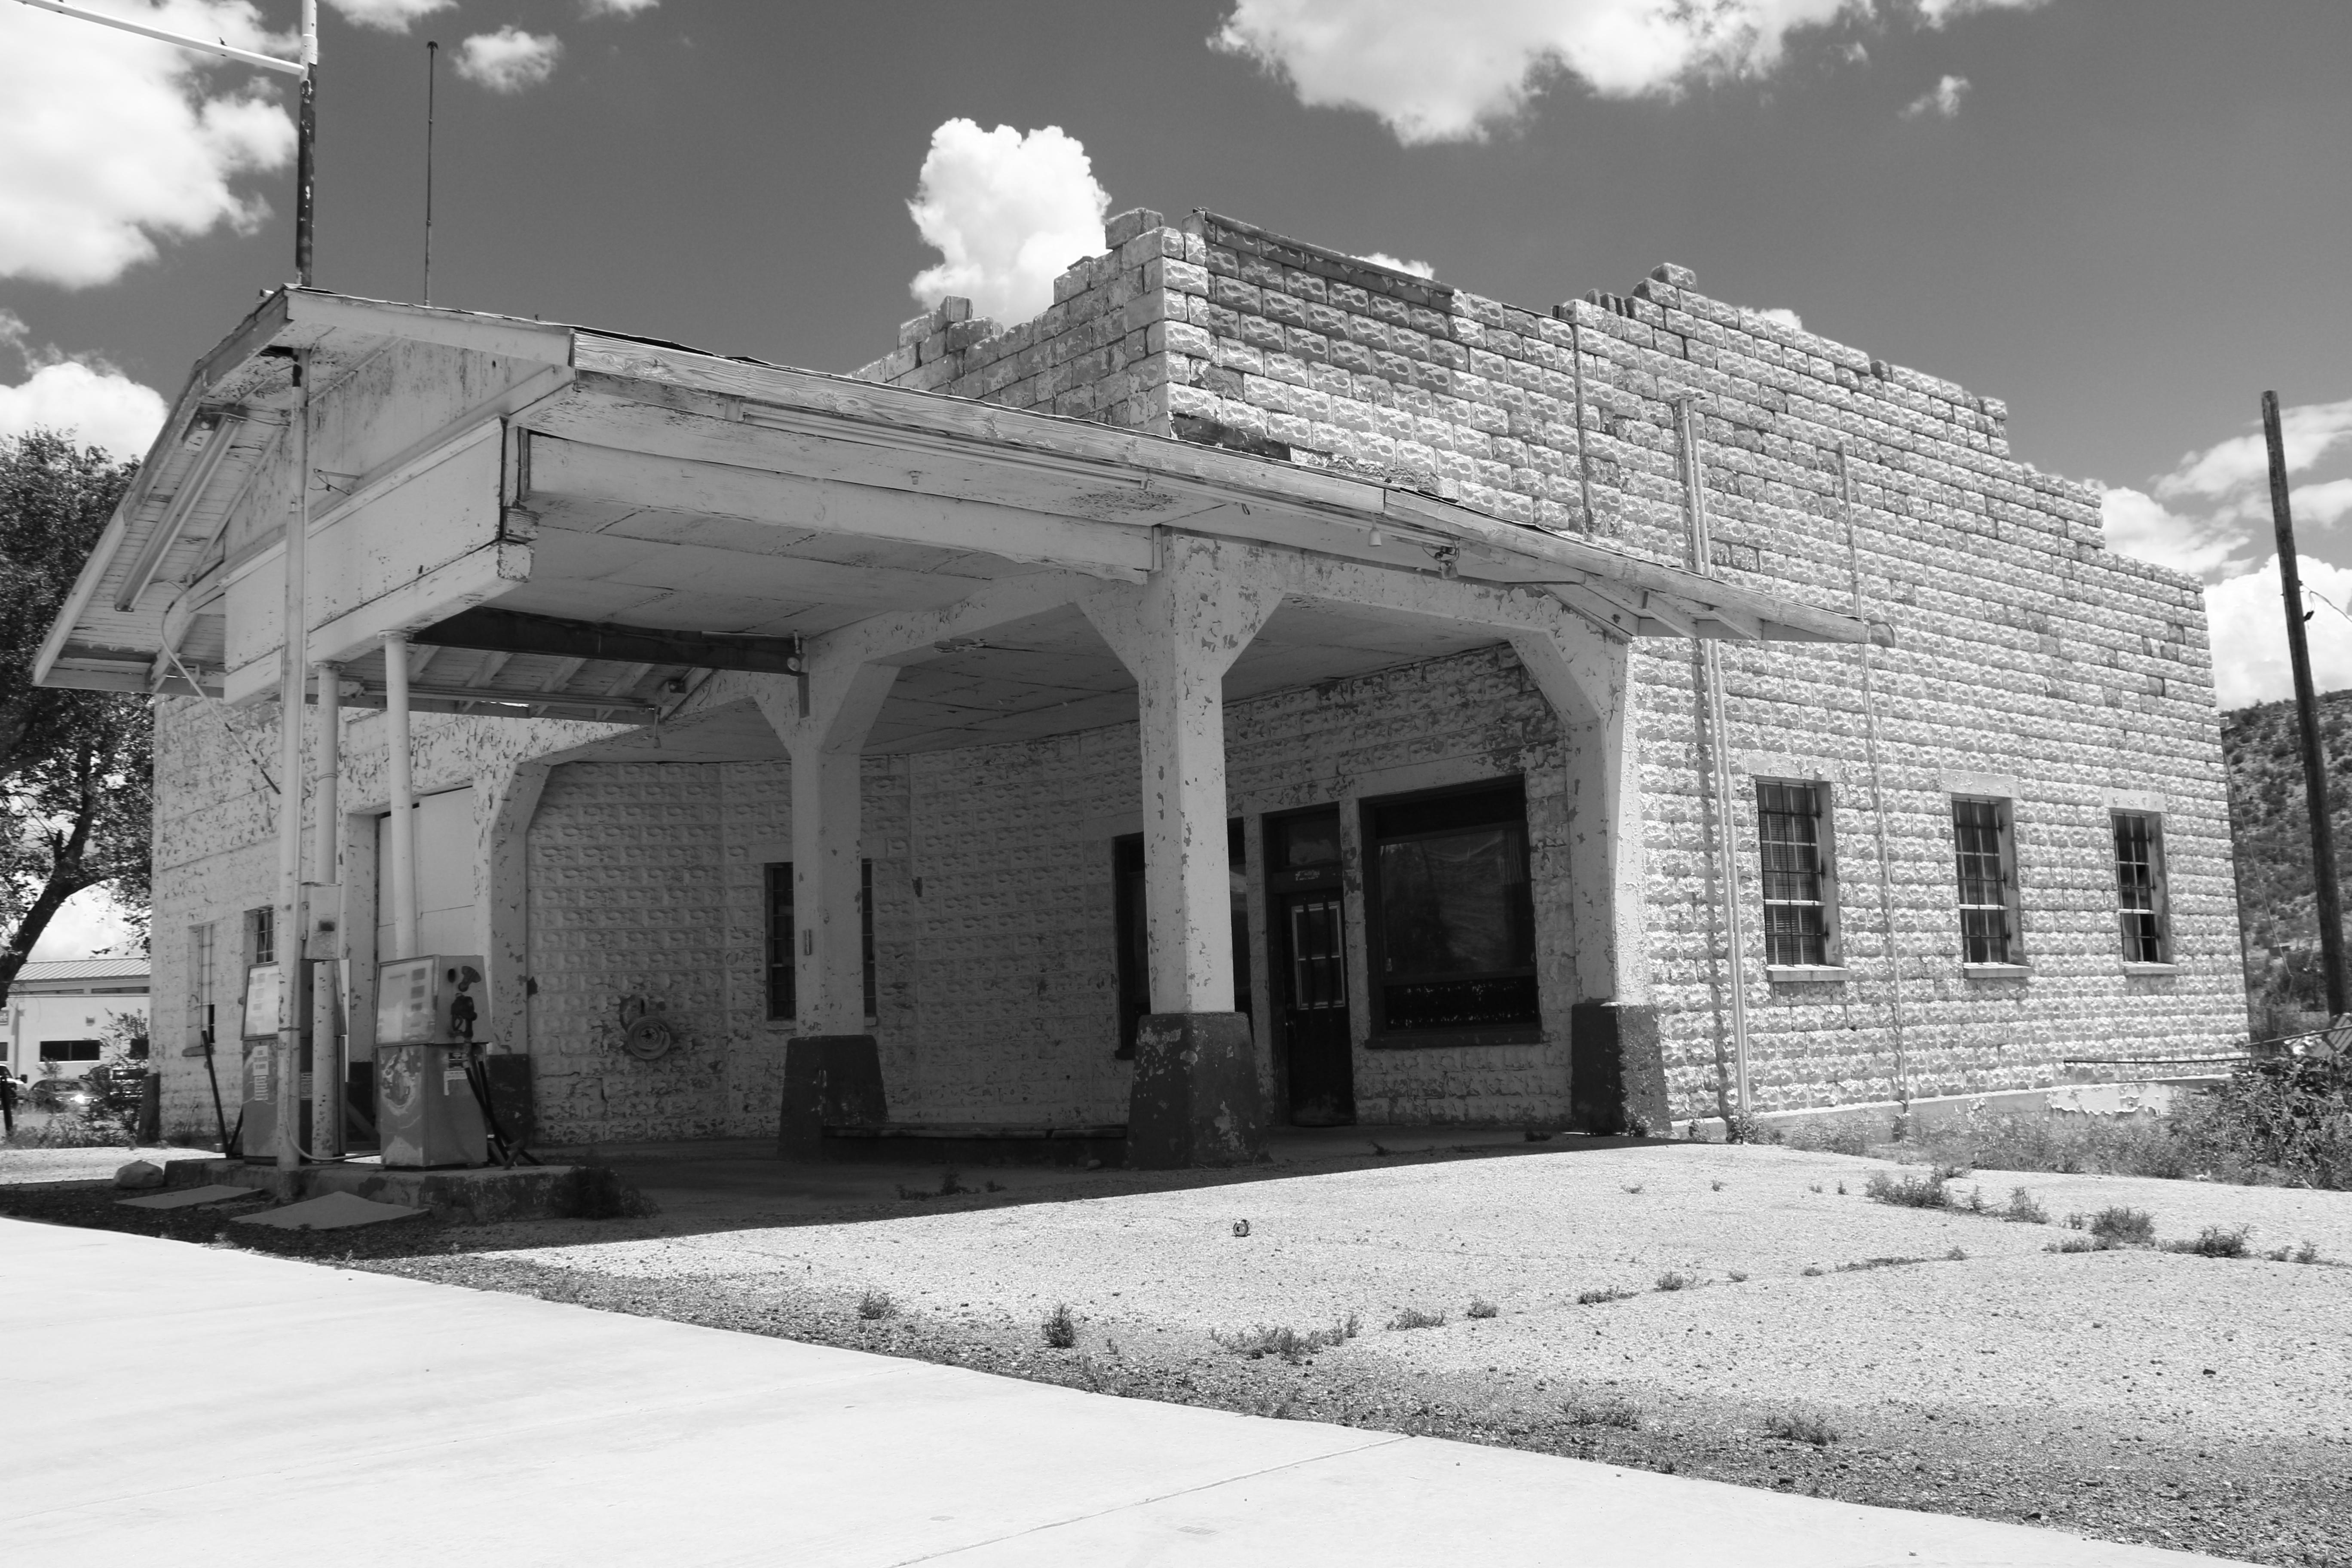 John Osterman Shell Station on Route 66